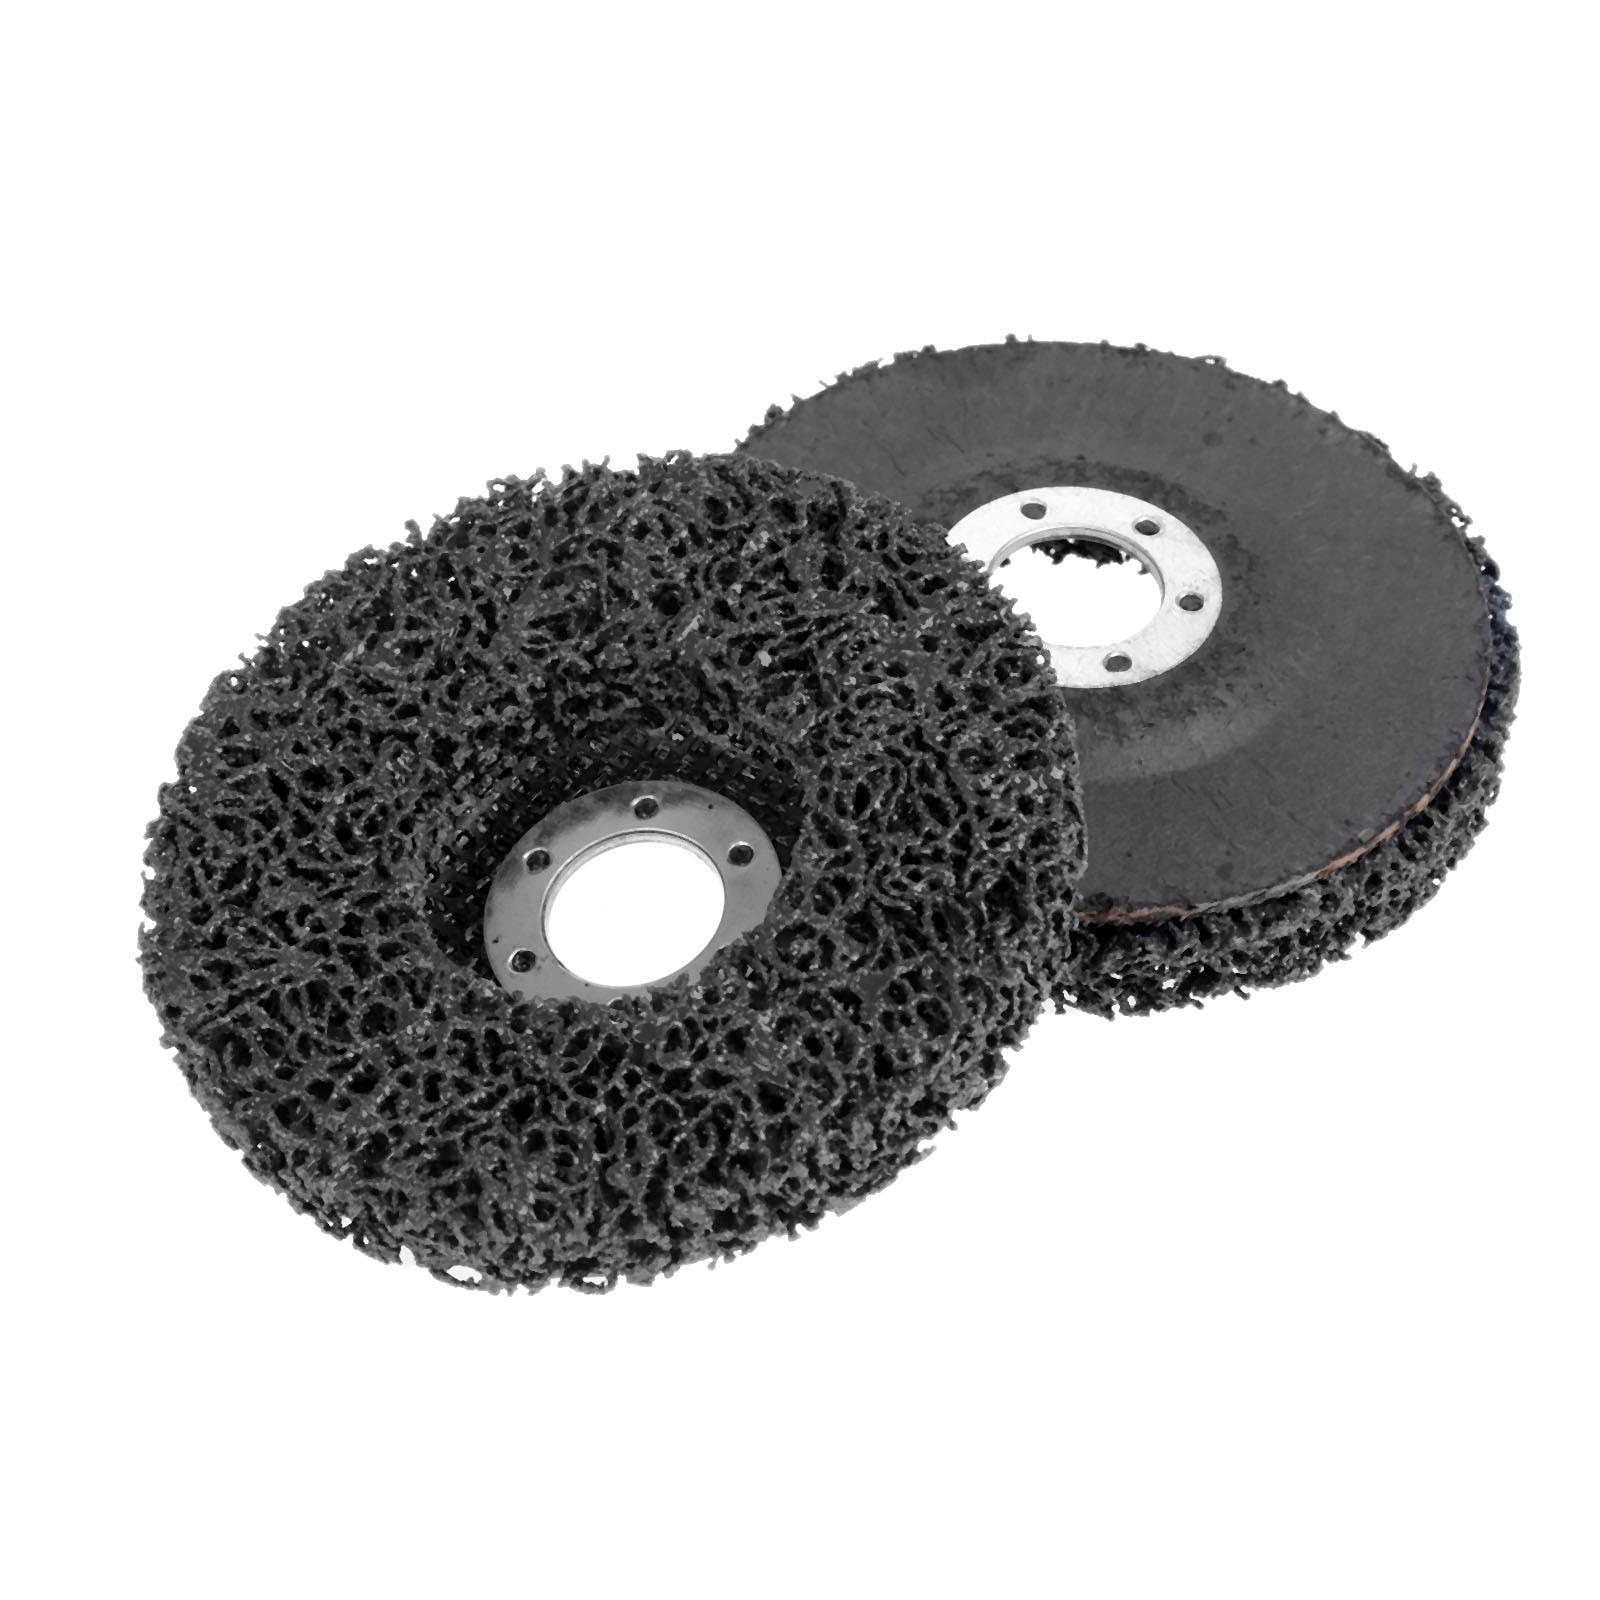 DRELD 1Pc 115*22mm Clean & Strip Coarse Grinding Disc Poly Strip Wheel Disc Paint Rust Removal Clean Grind Wheel Grinder Tools